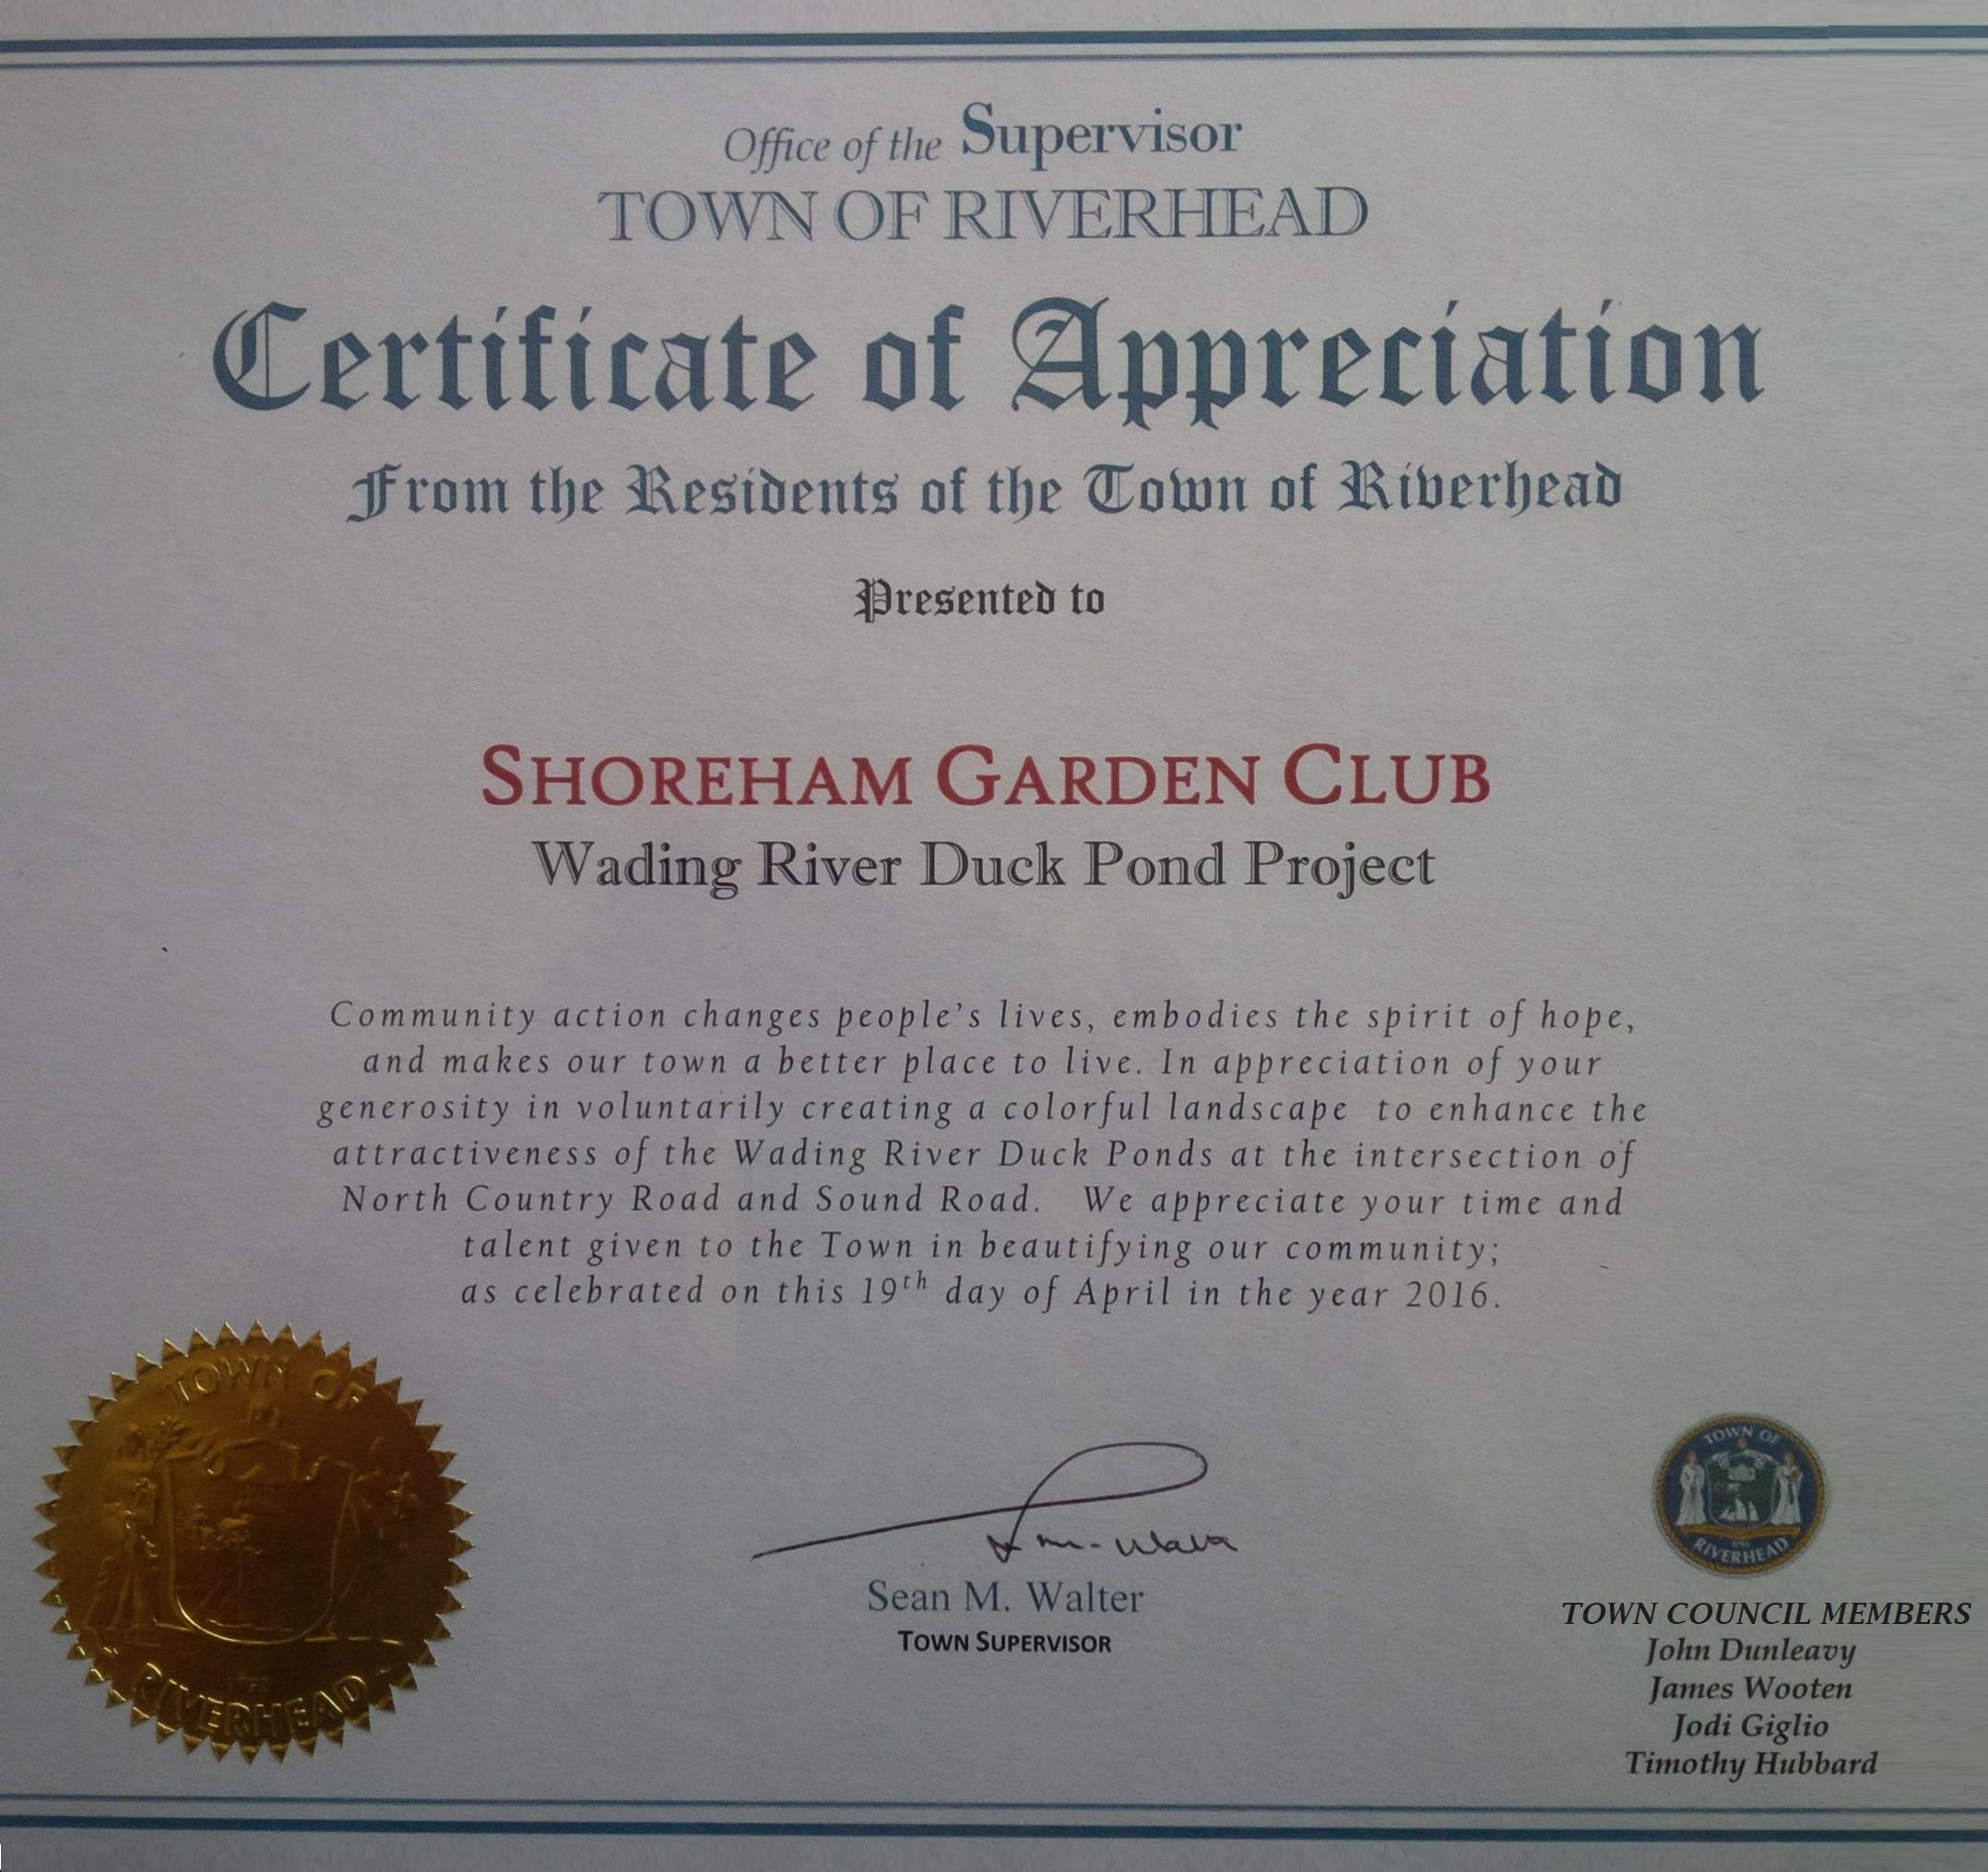 Town of Riverhead Certificate of Appreciation